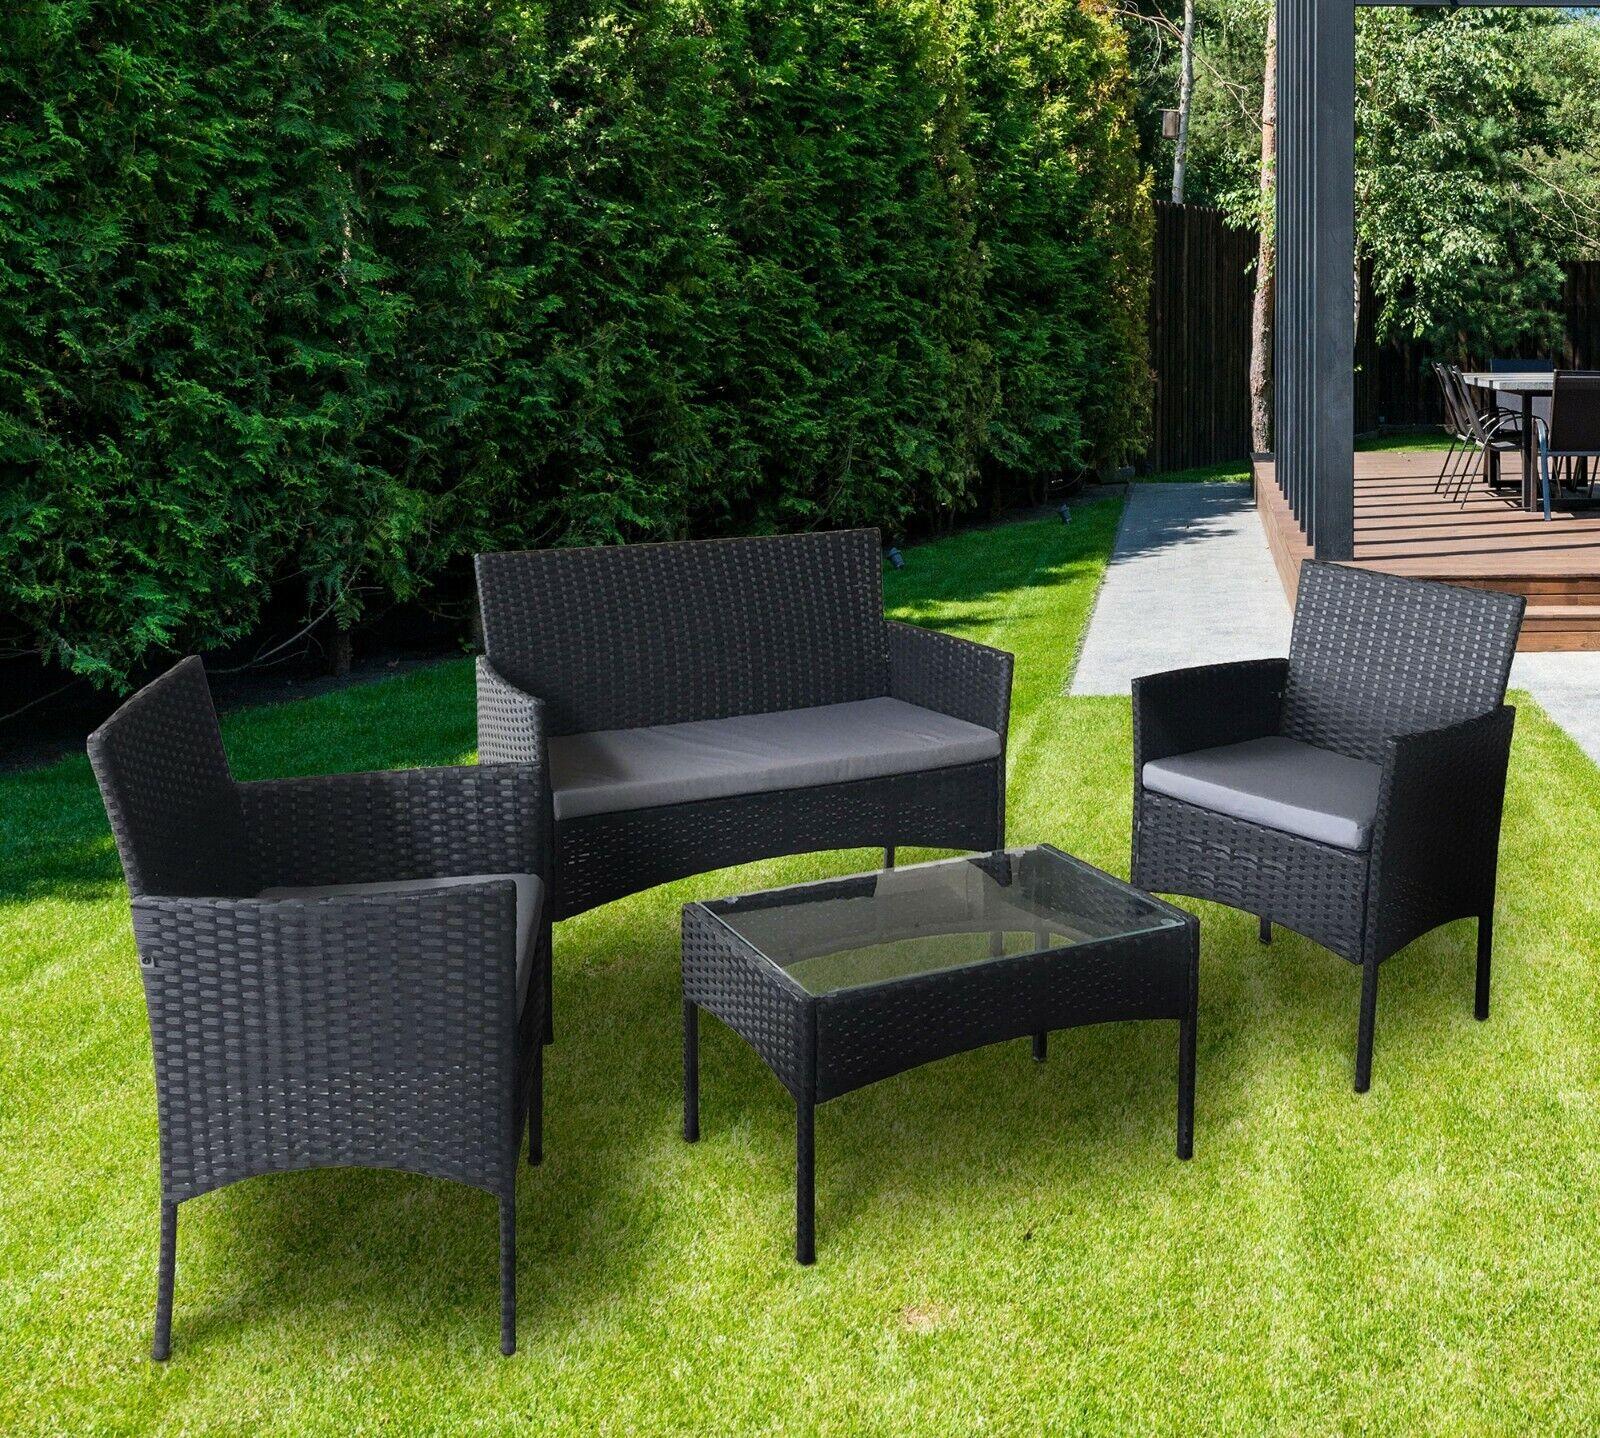 Garden Furniture - 4pcs Rattan Outdoor Garden Furniture Sofa Set Table & Chairs (Roger Black )